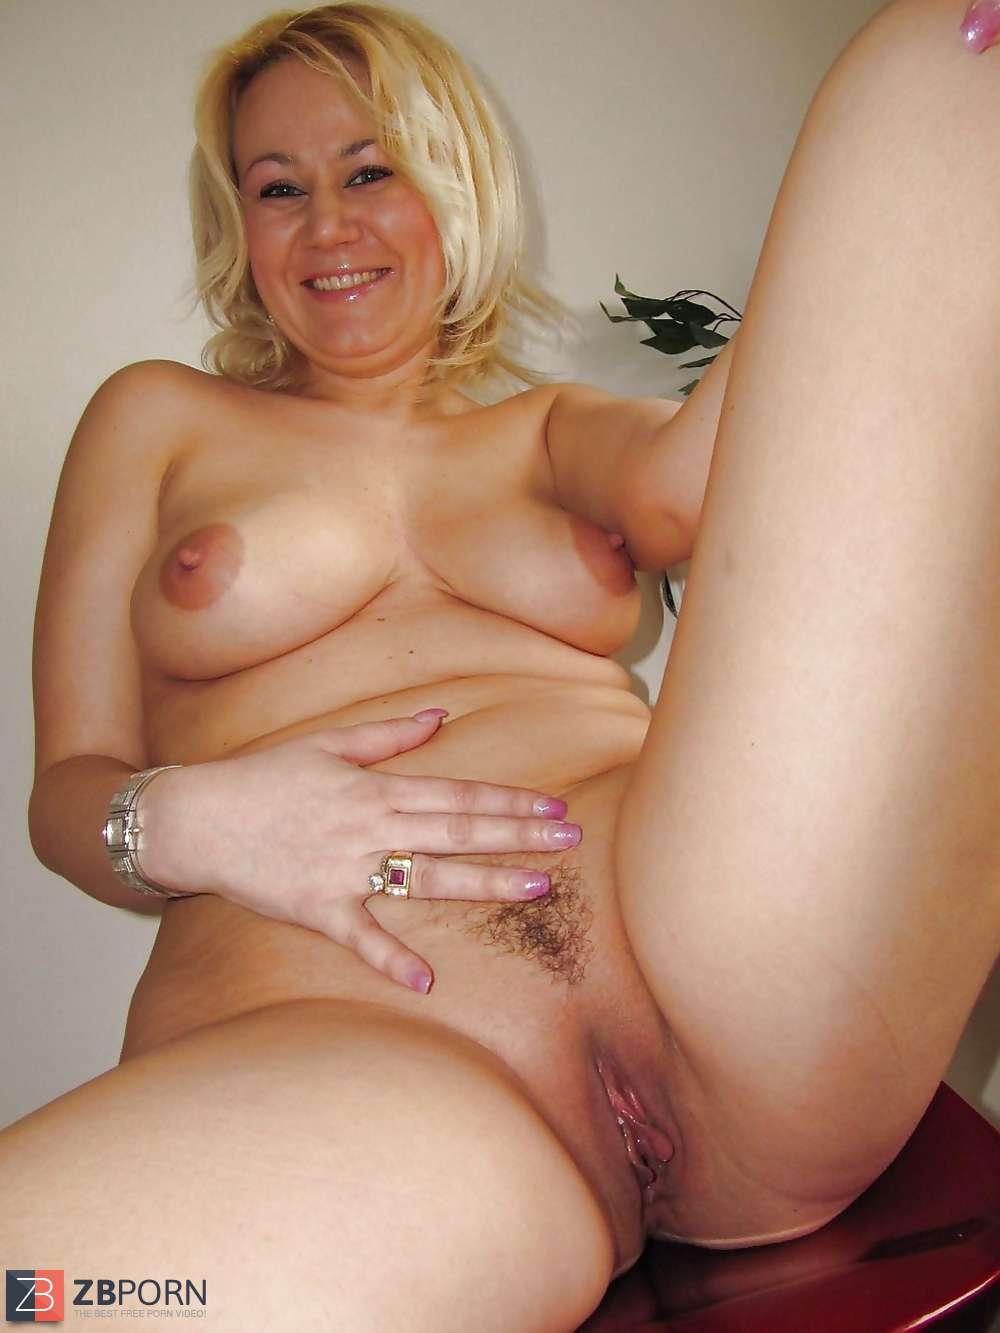 Natali blond feet